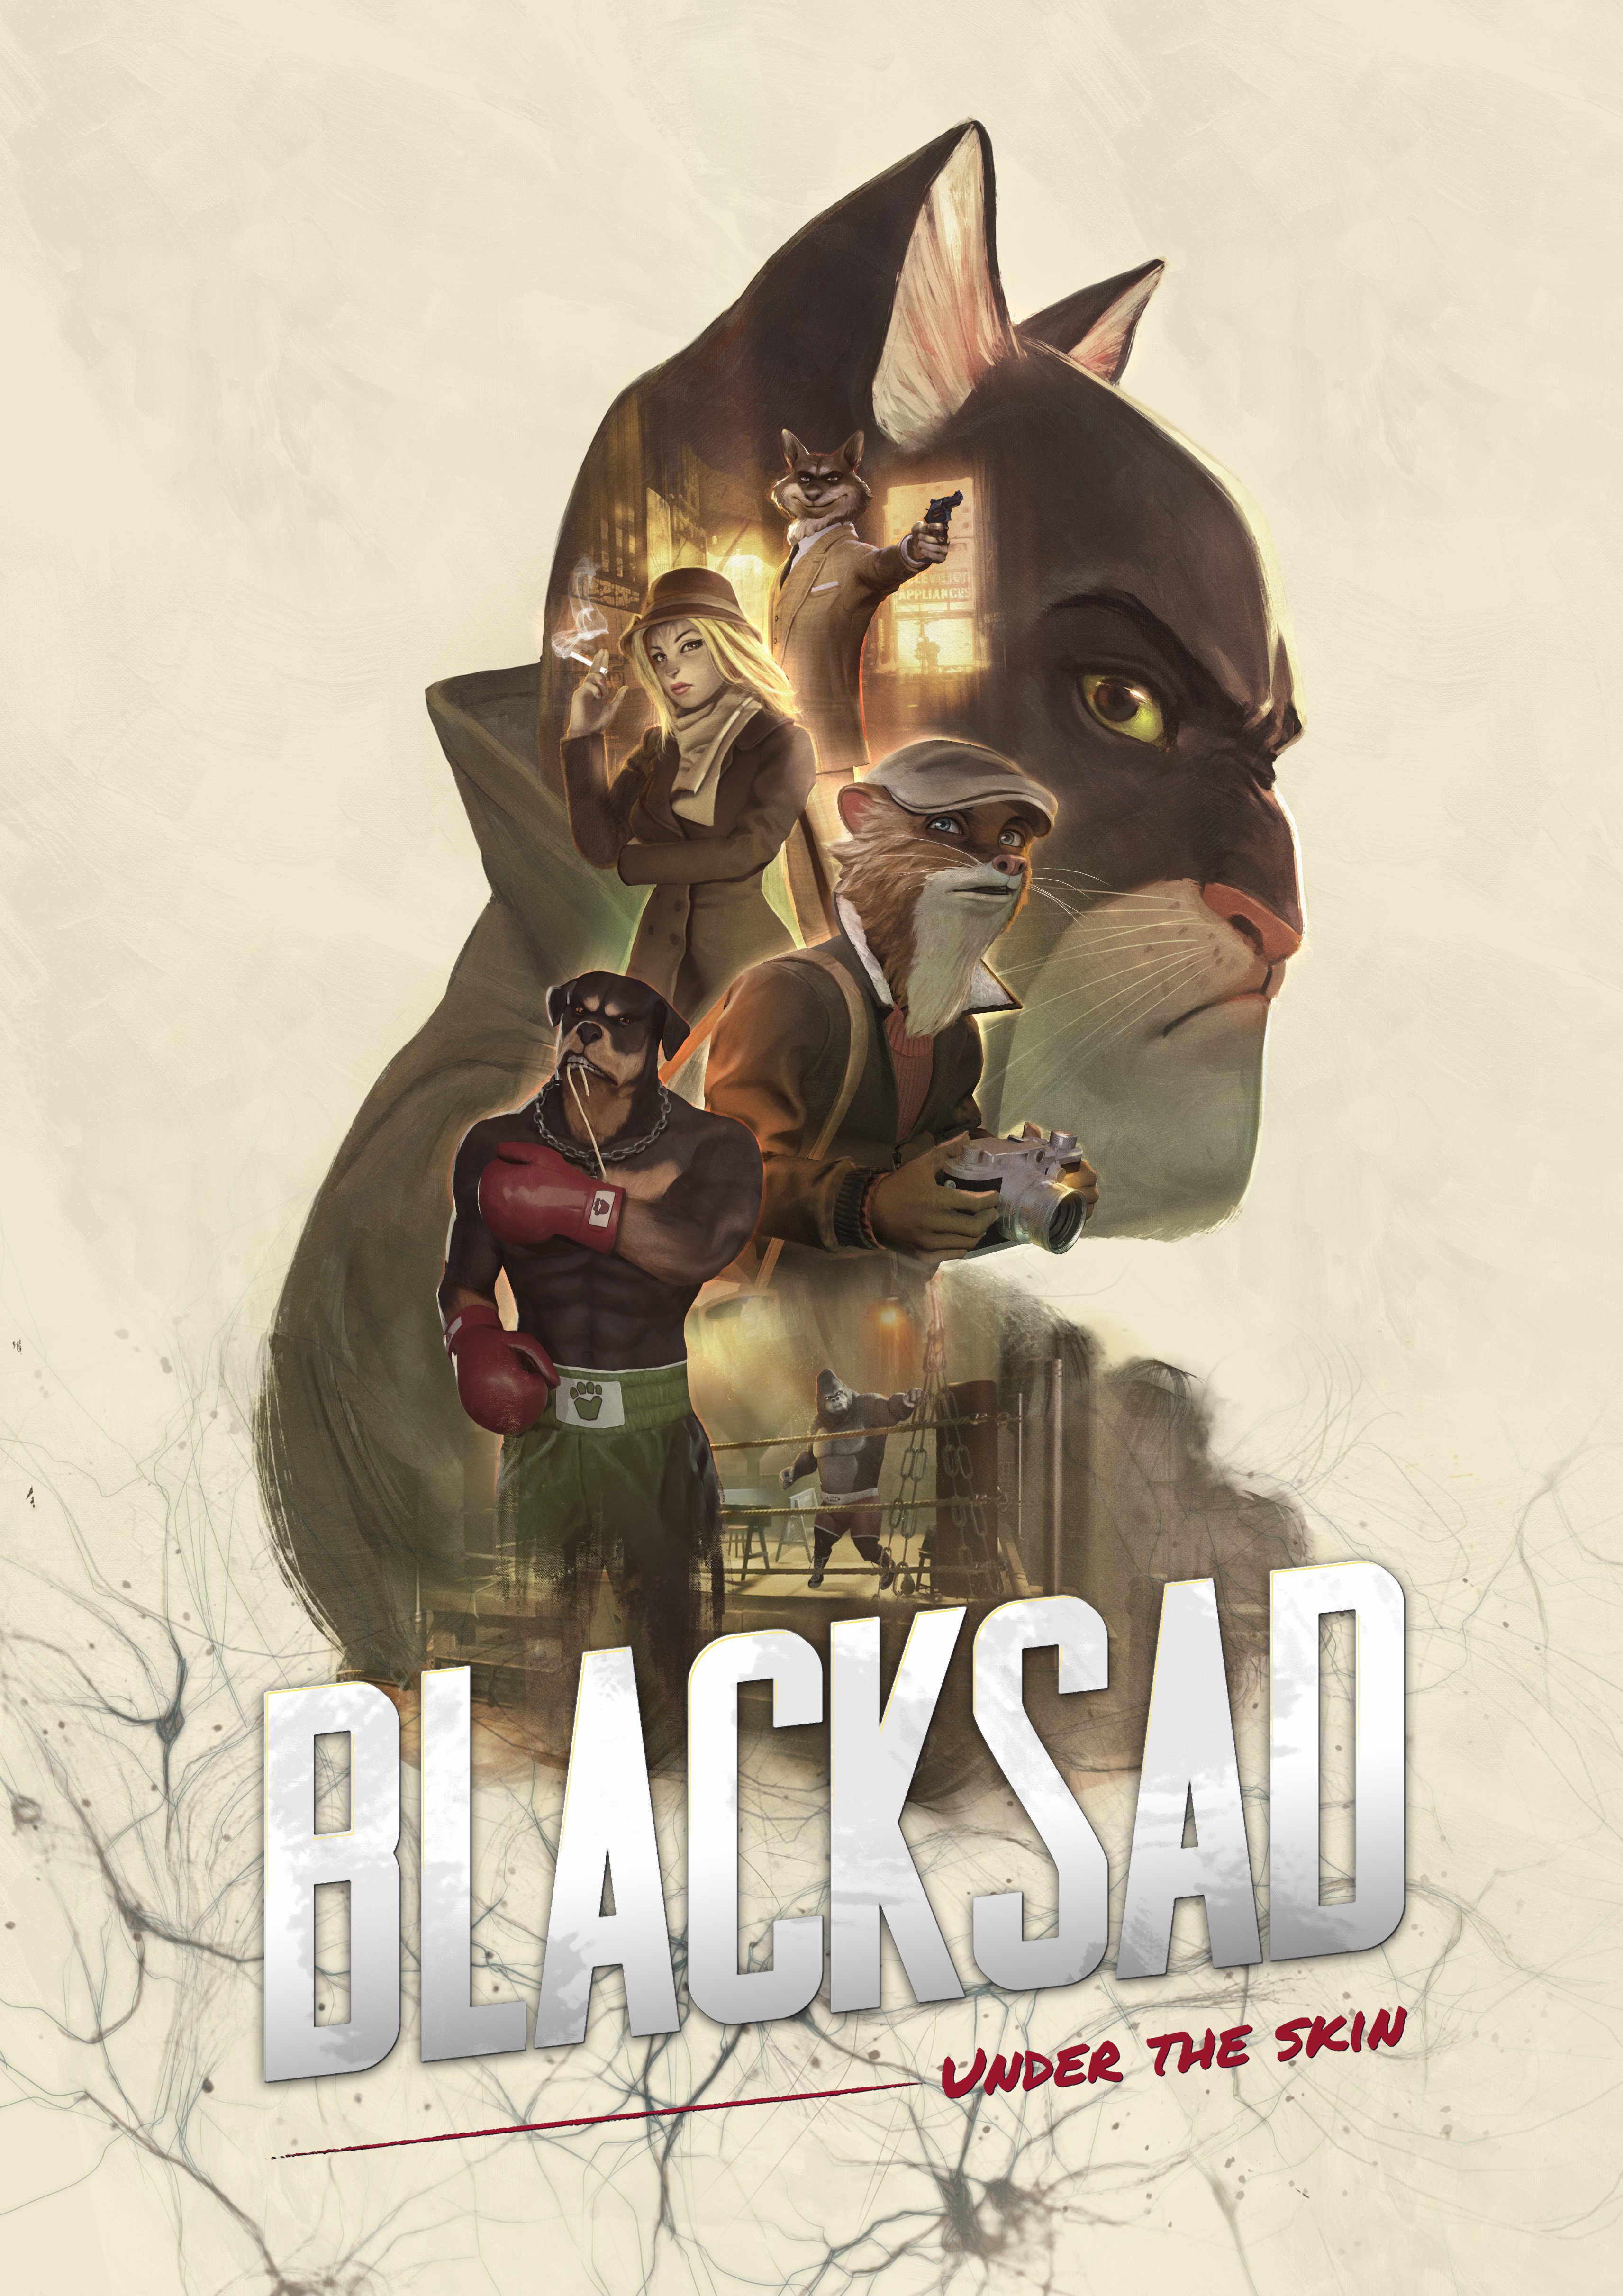 BlacksadKEYART2_end.jpg